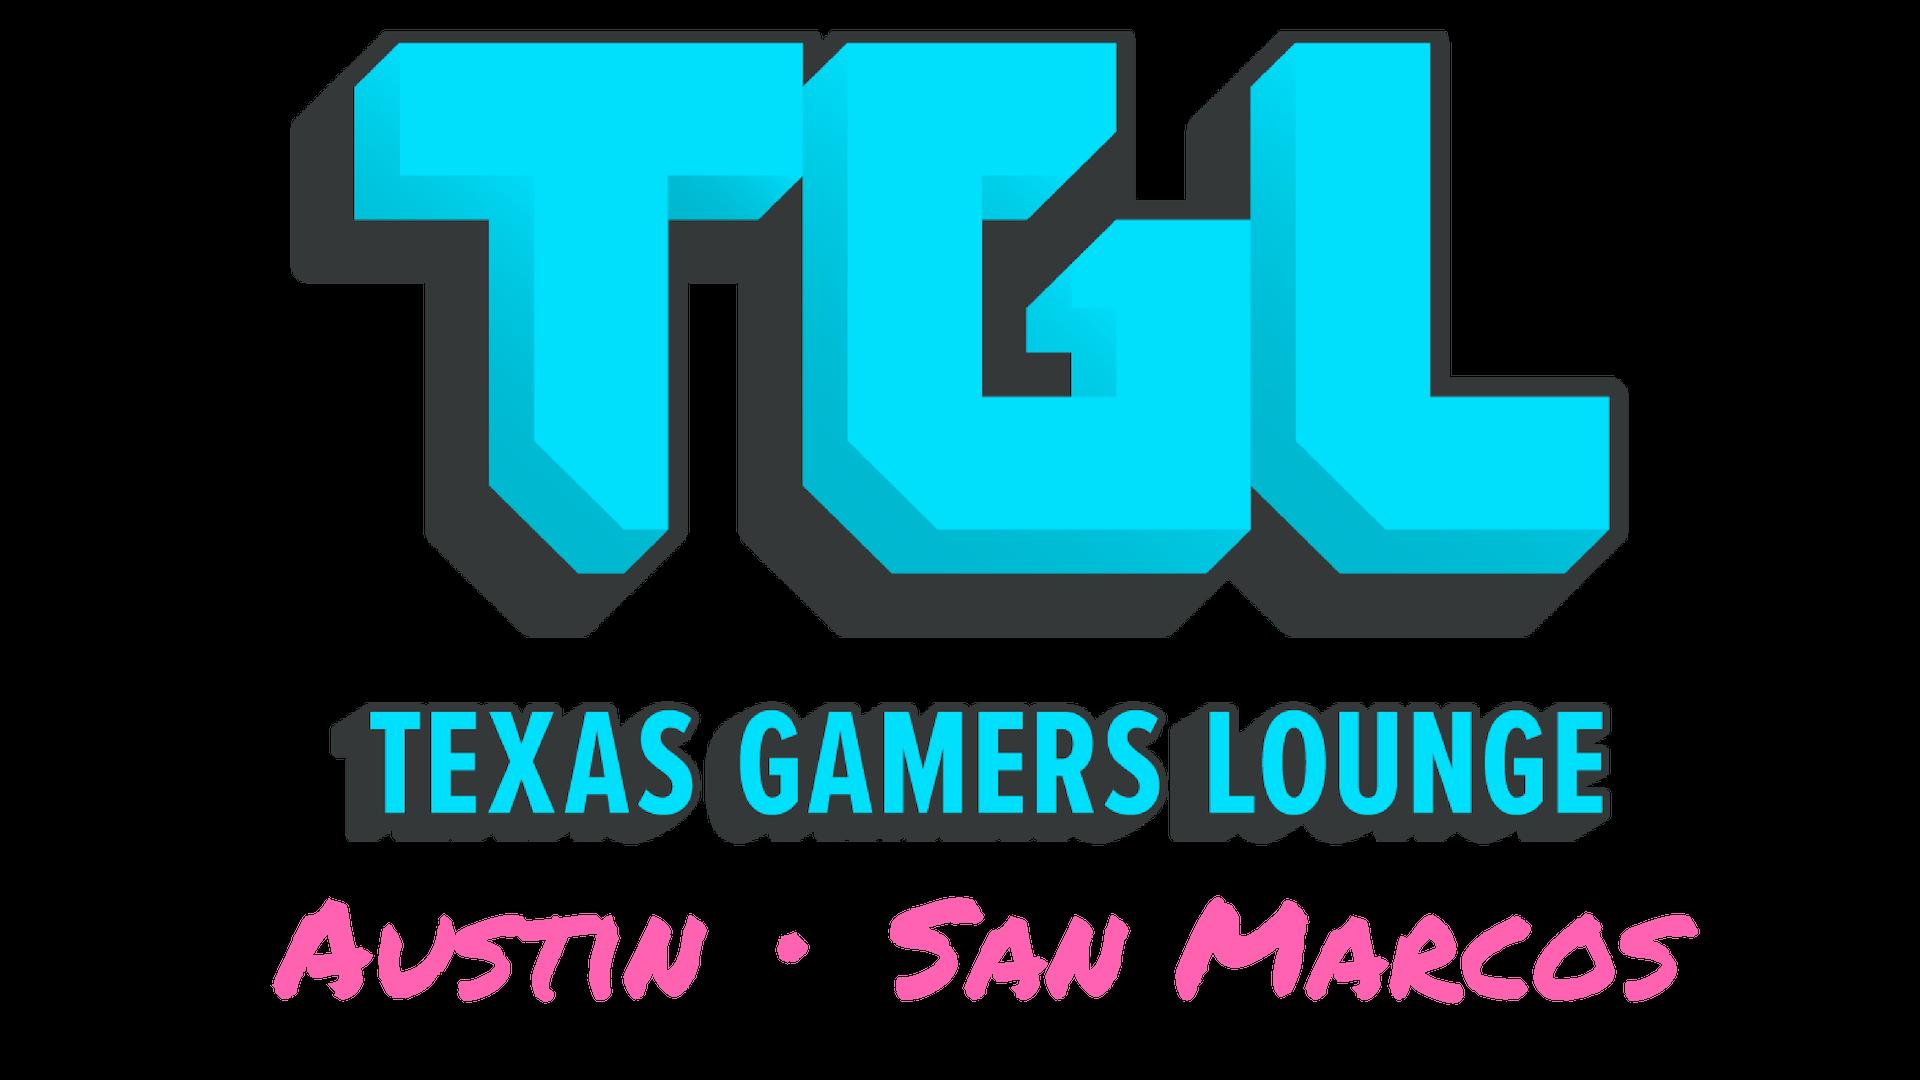 TGL Austin San Marcos - Transparent